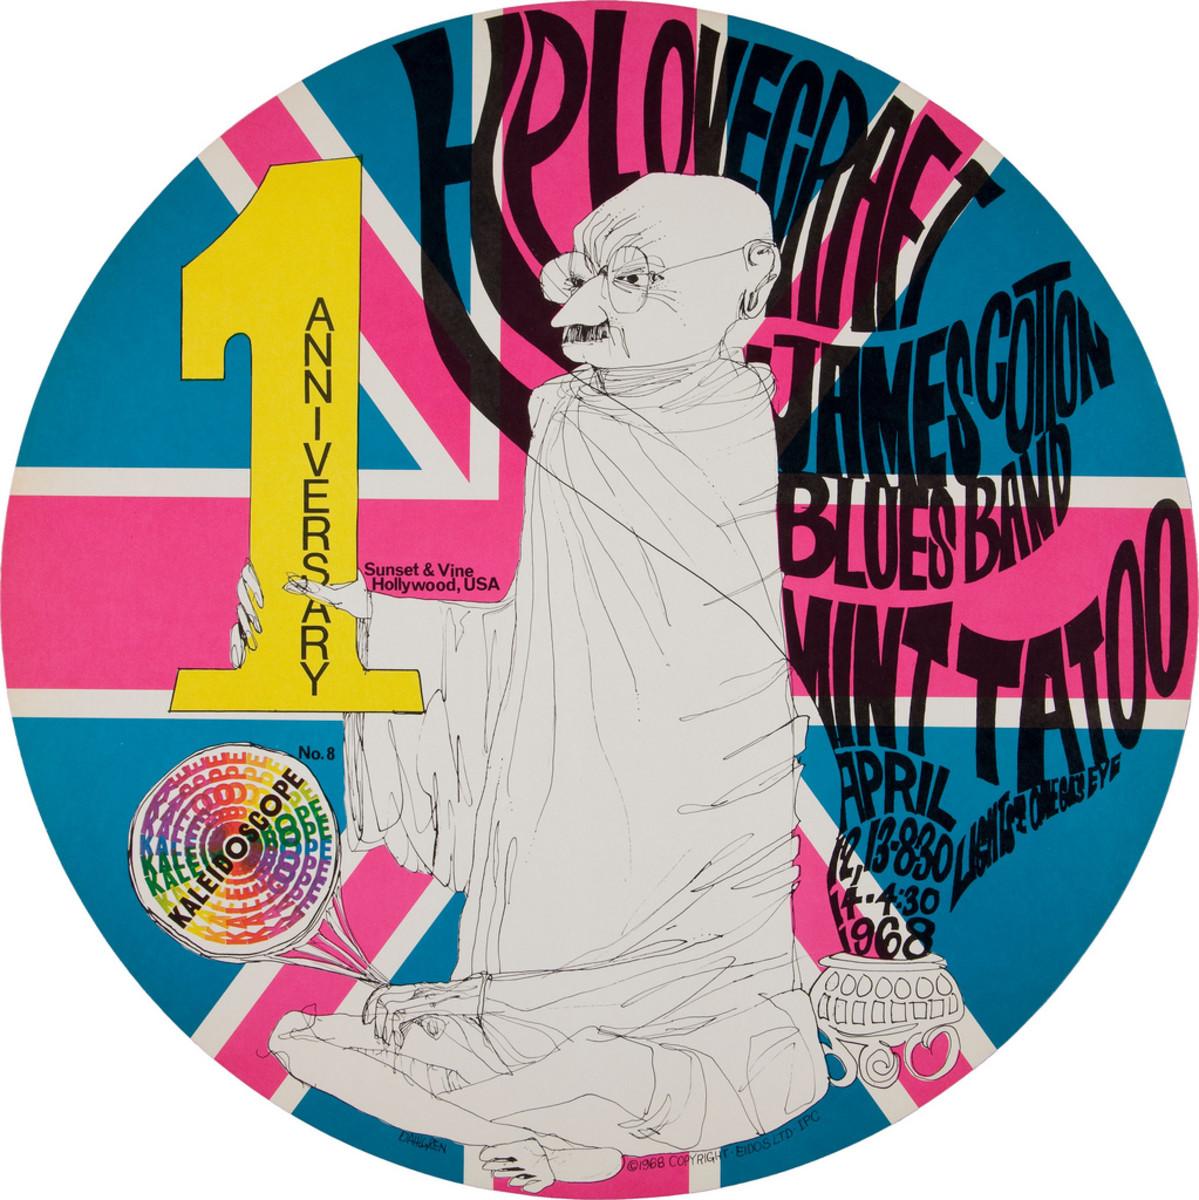 H.P. Lovecraft, James Cotton Blues Band, Mint Tattoo, Kaleidoscope Concert Poster (1968)  Poster #8 In Series Art by Dick Dahlgren